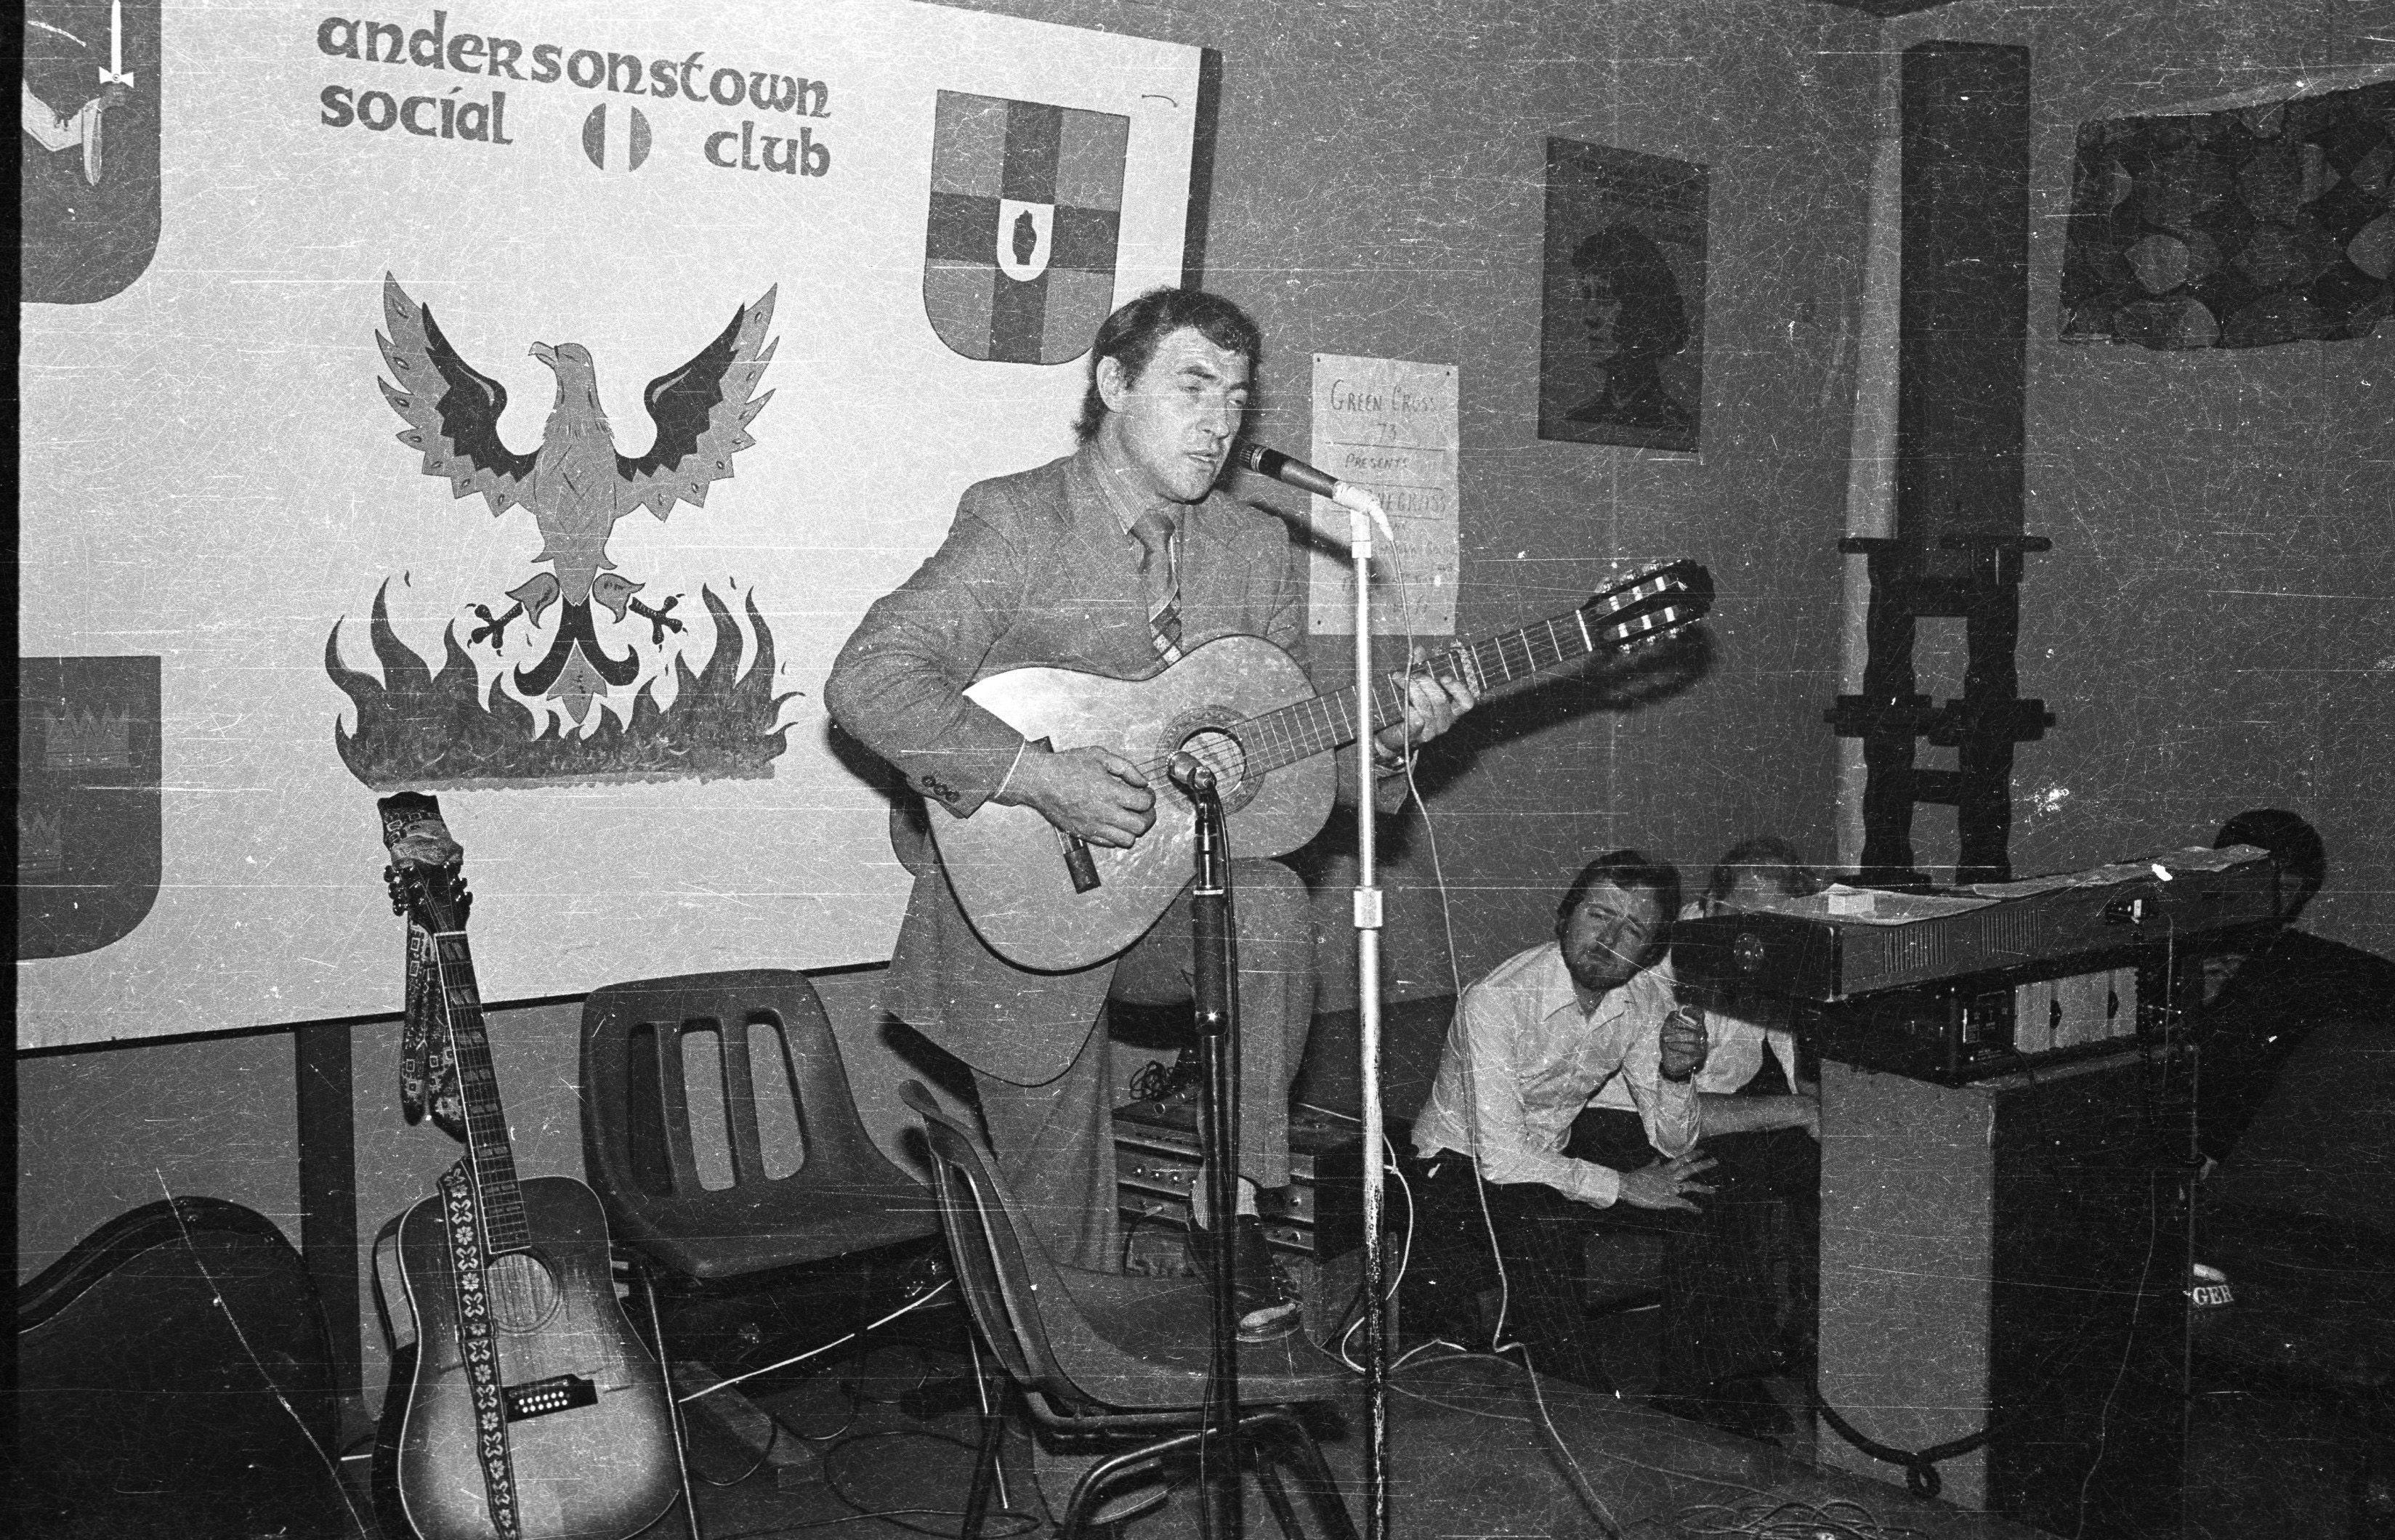 "\""OCH, OCH\"": Albert Fry, in a rare performance outside of Cumann Chluain Ard, playing at the Oíche Ghaelach in Andersonstown Social Club back in 1979."